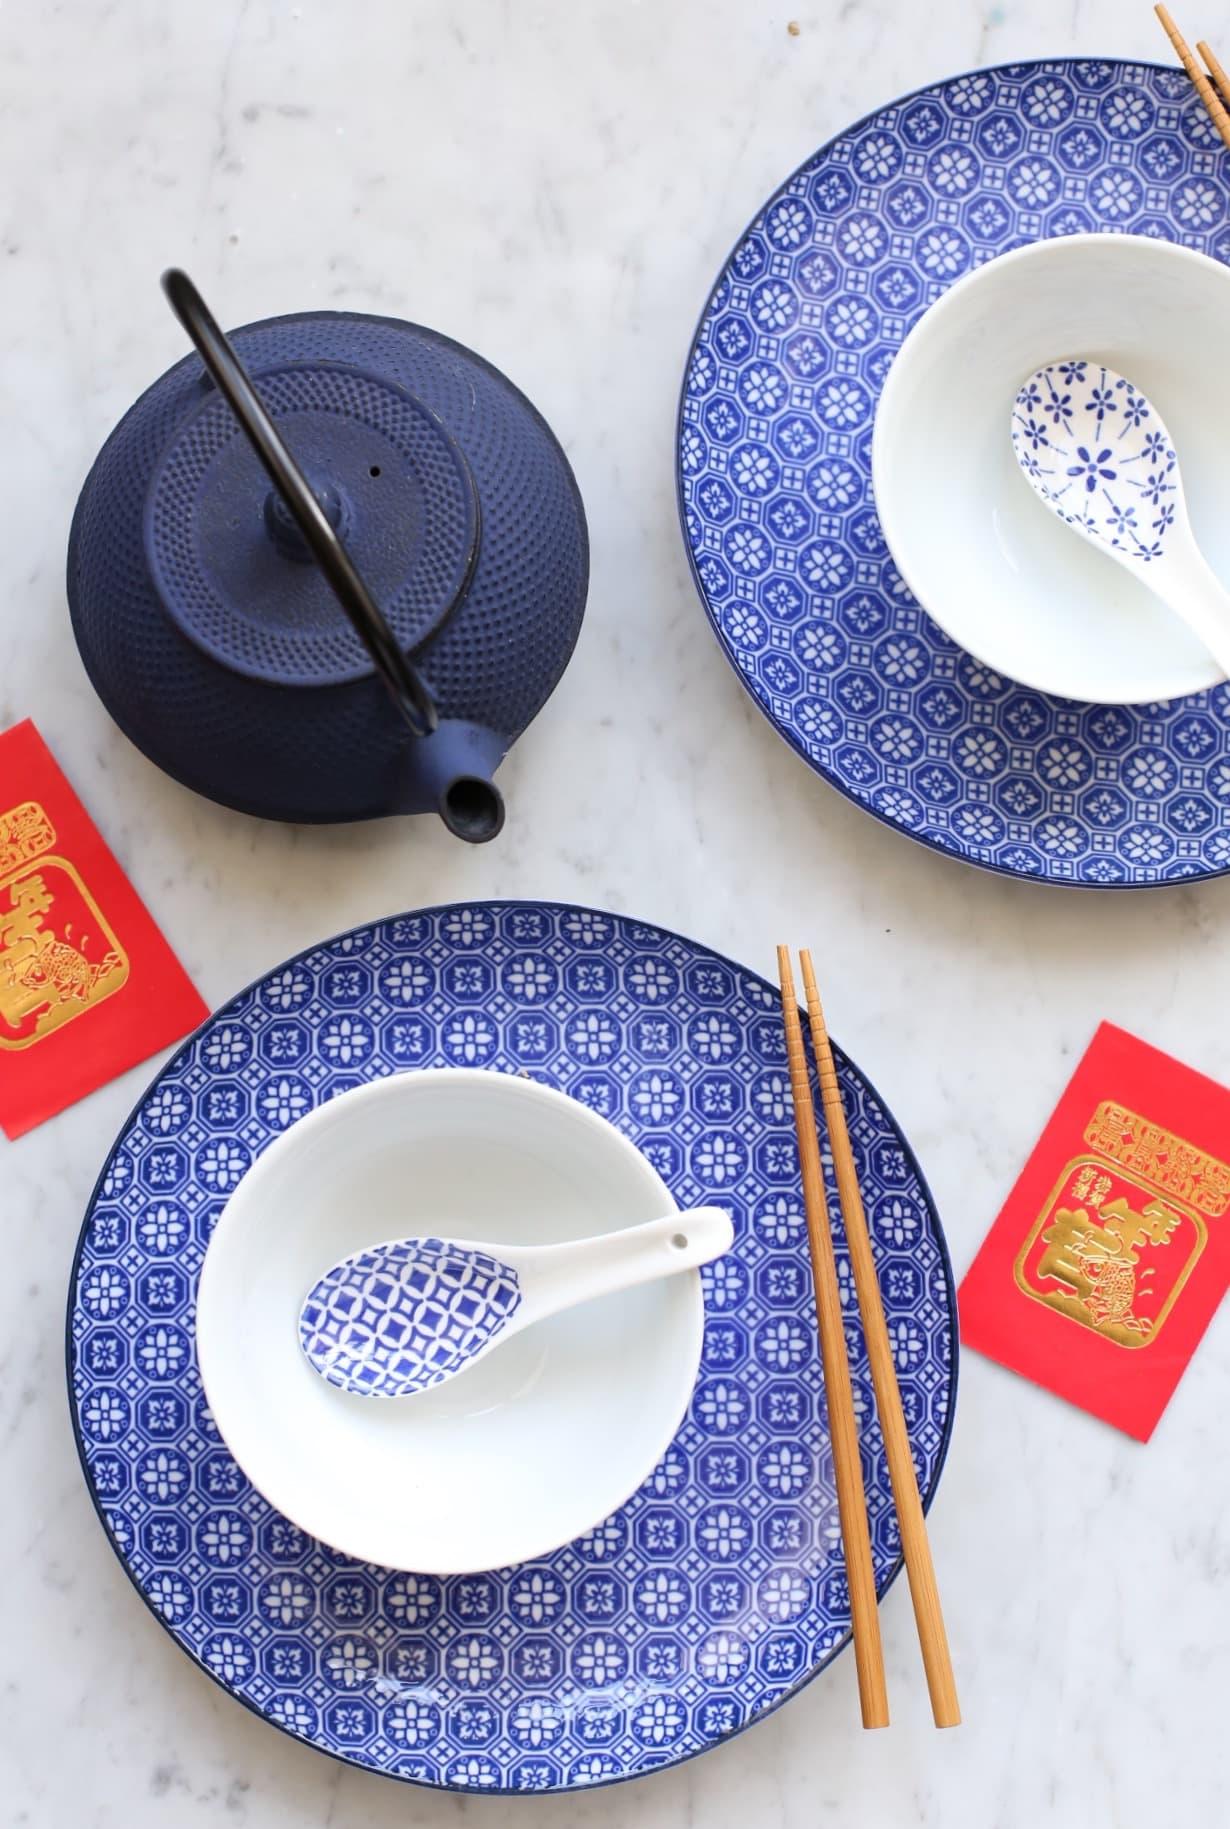 image - 7 x Authentieke Chinese restaurants